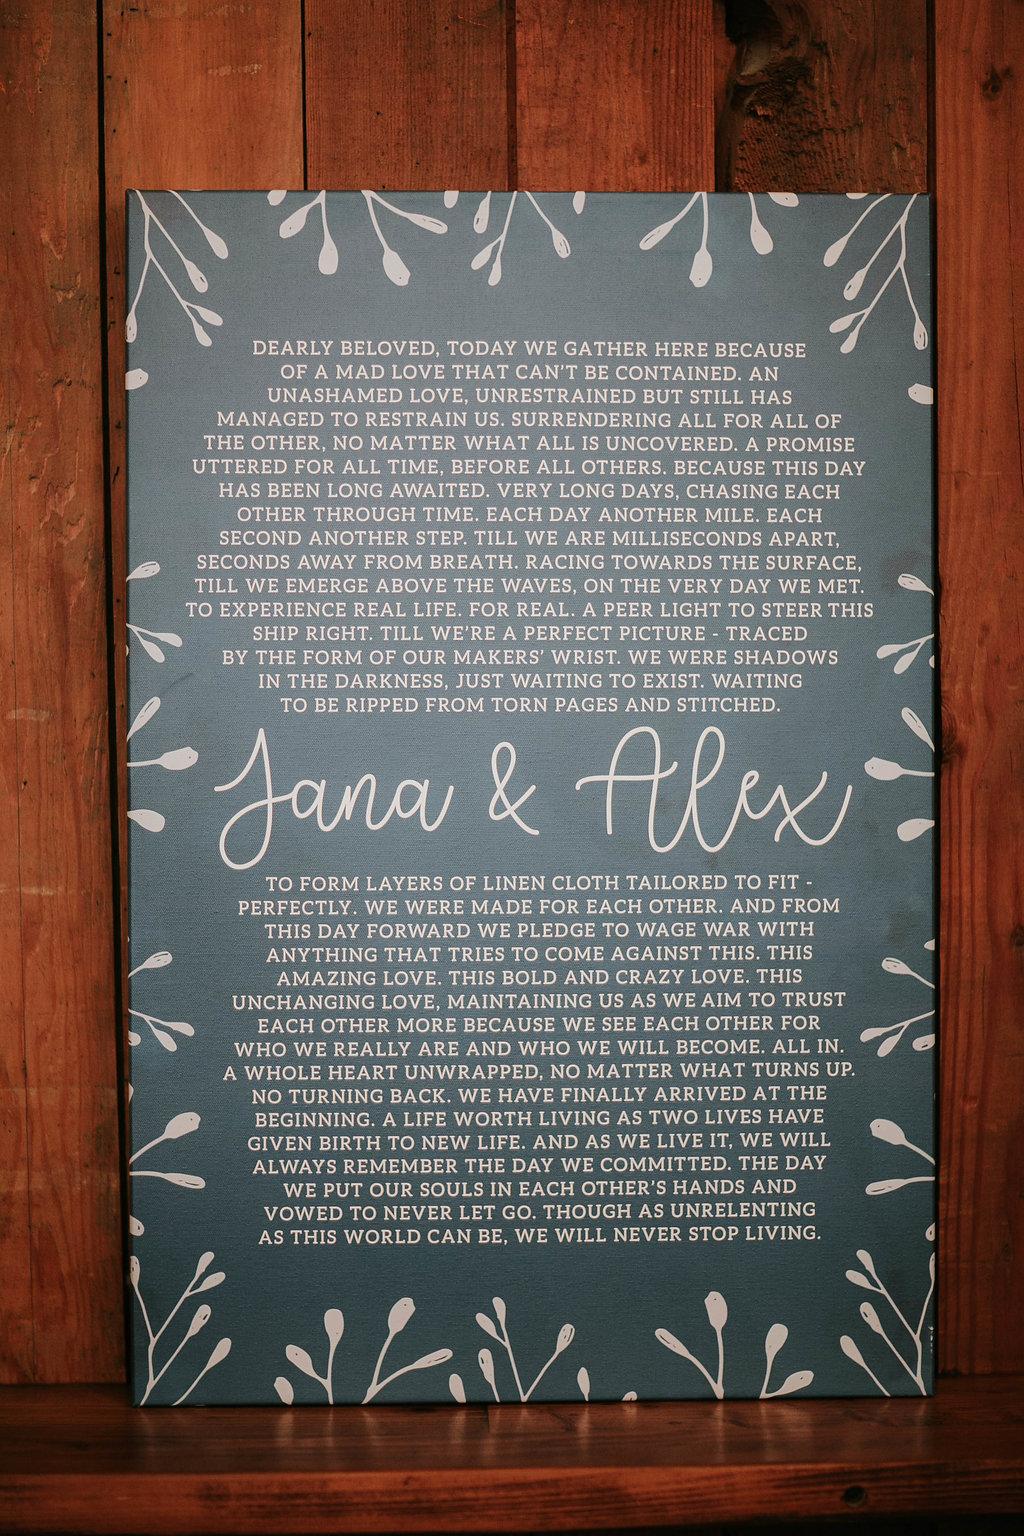 The_Big_Fake_wedding_Seattle_Within_sodo_wedding_by_Adina_Preston_Weddings_344.JPG